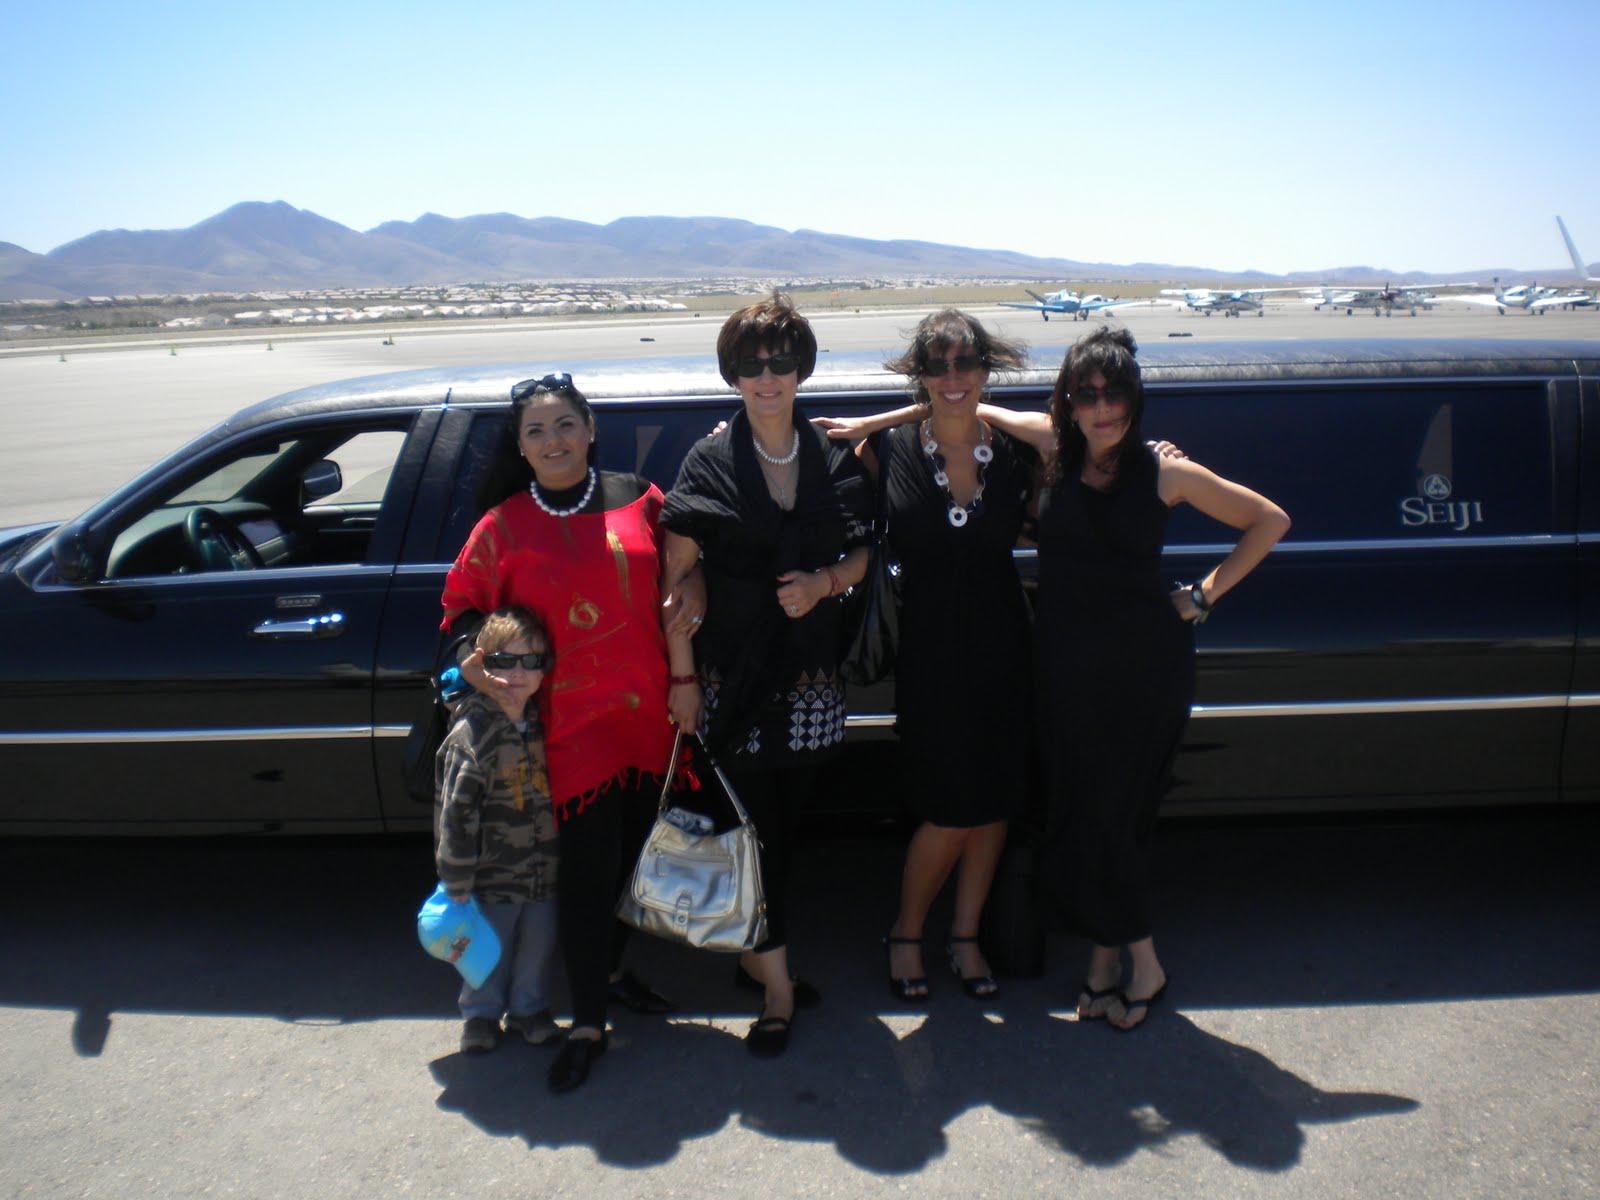 http://3.bp.blogspot.com/_sxv7OOI_sKY/S_tV4Nudn0I/AAAAAAAAAqY/aVv8n5PbZ98/s1600/5-22-2010+Cher+in+Vegas+284.JPG